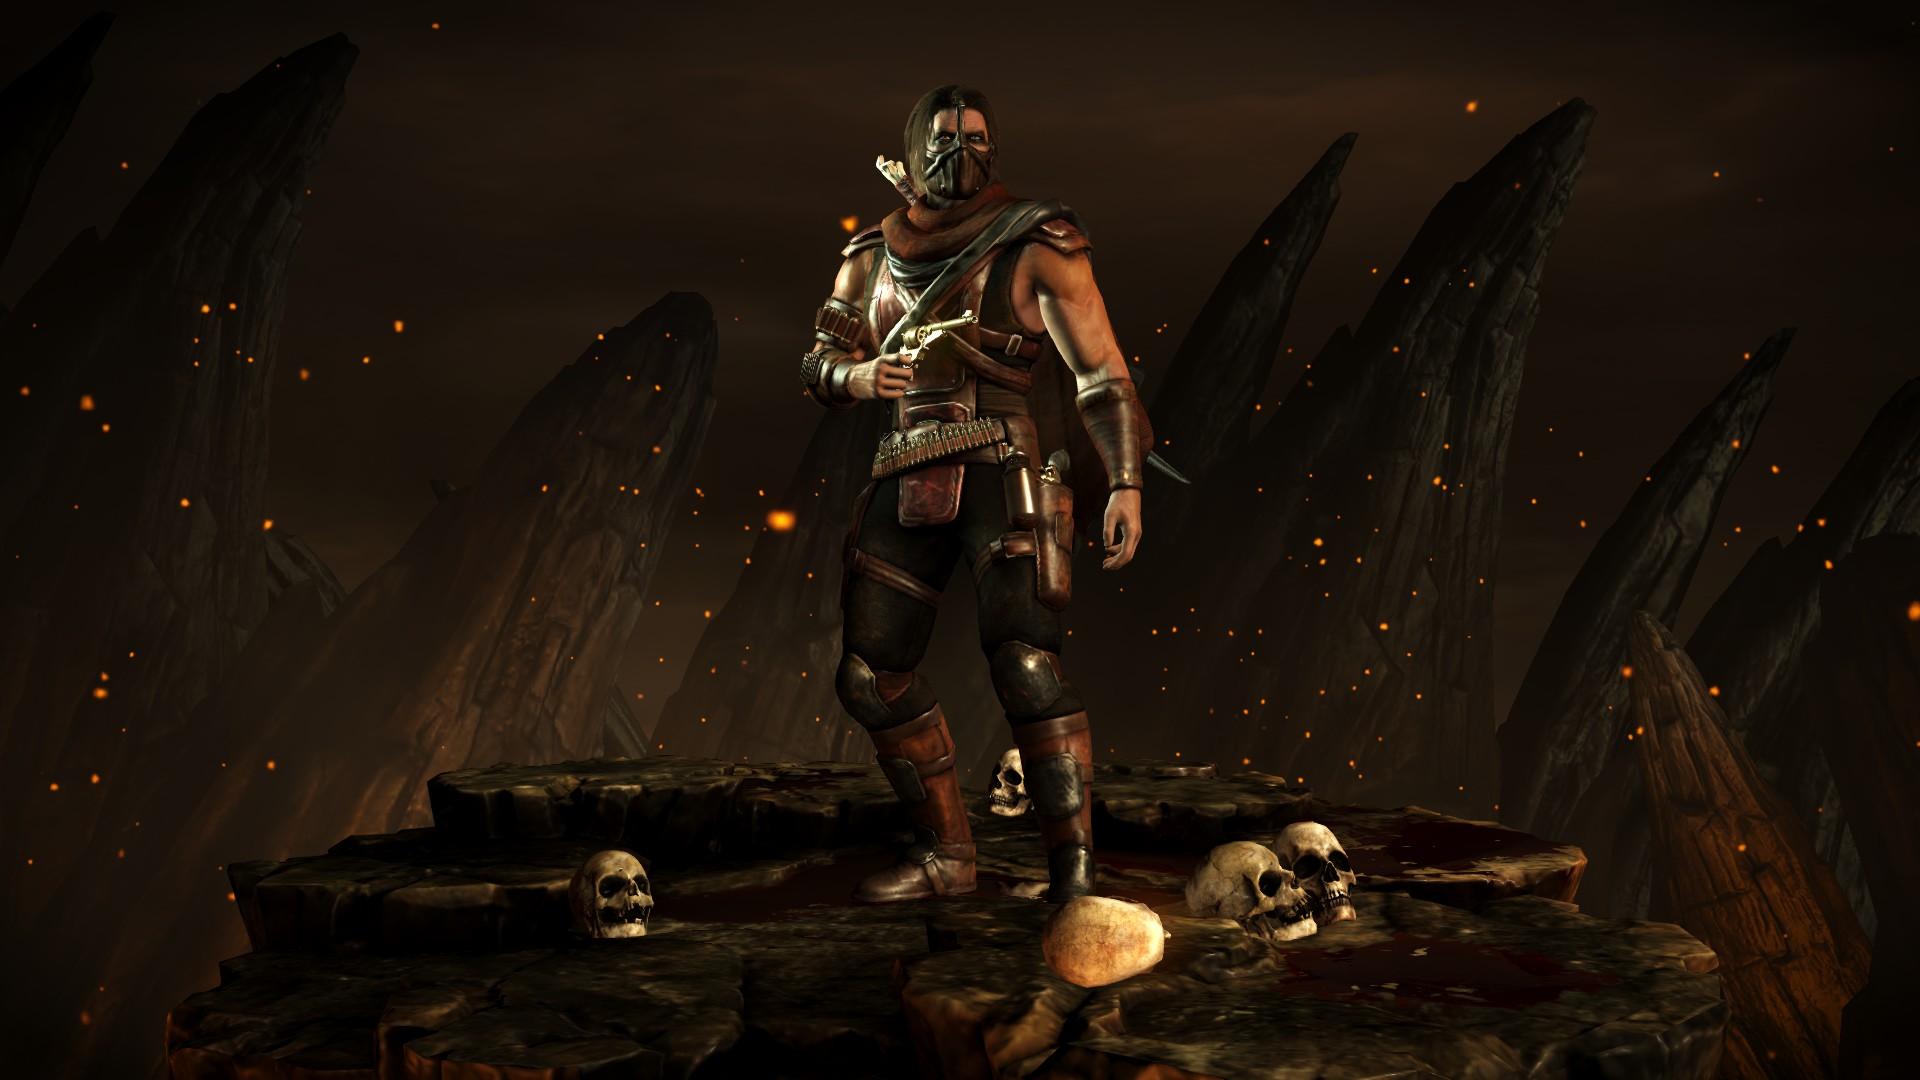 Эррон Блэк (Стиль: Преступник) - Mortal Kombat X Эррон Блэк